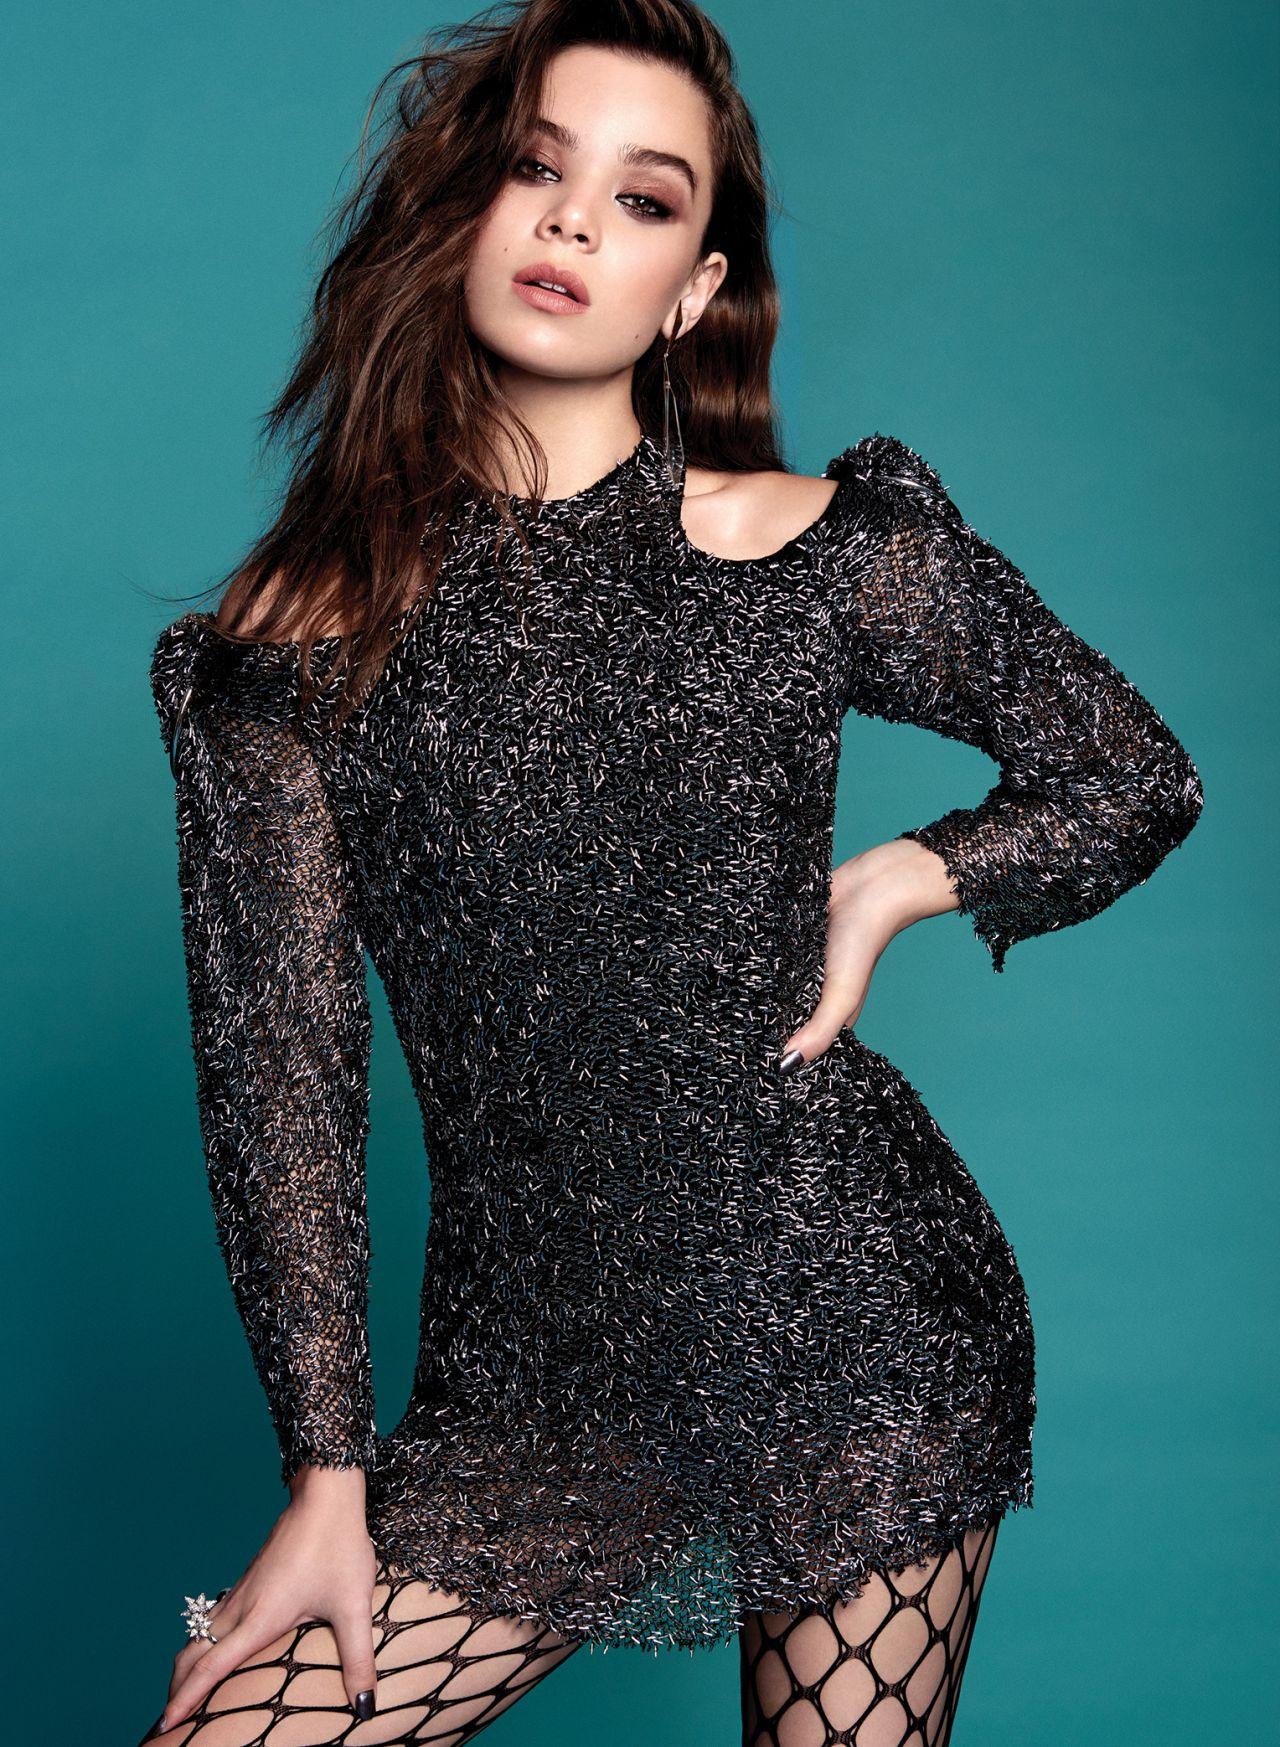 hailee_steinfeld_fashion_canada_magazine_winter_2017_3